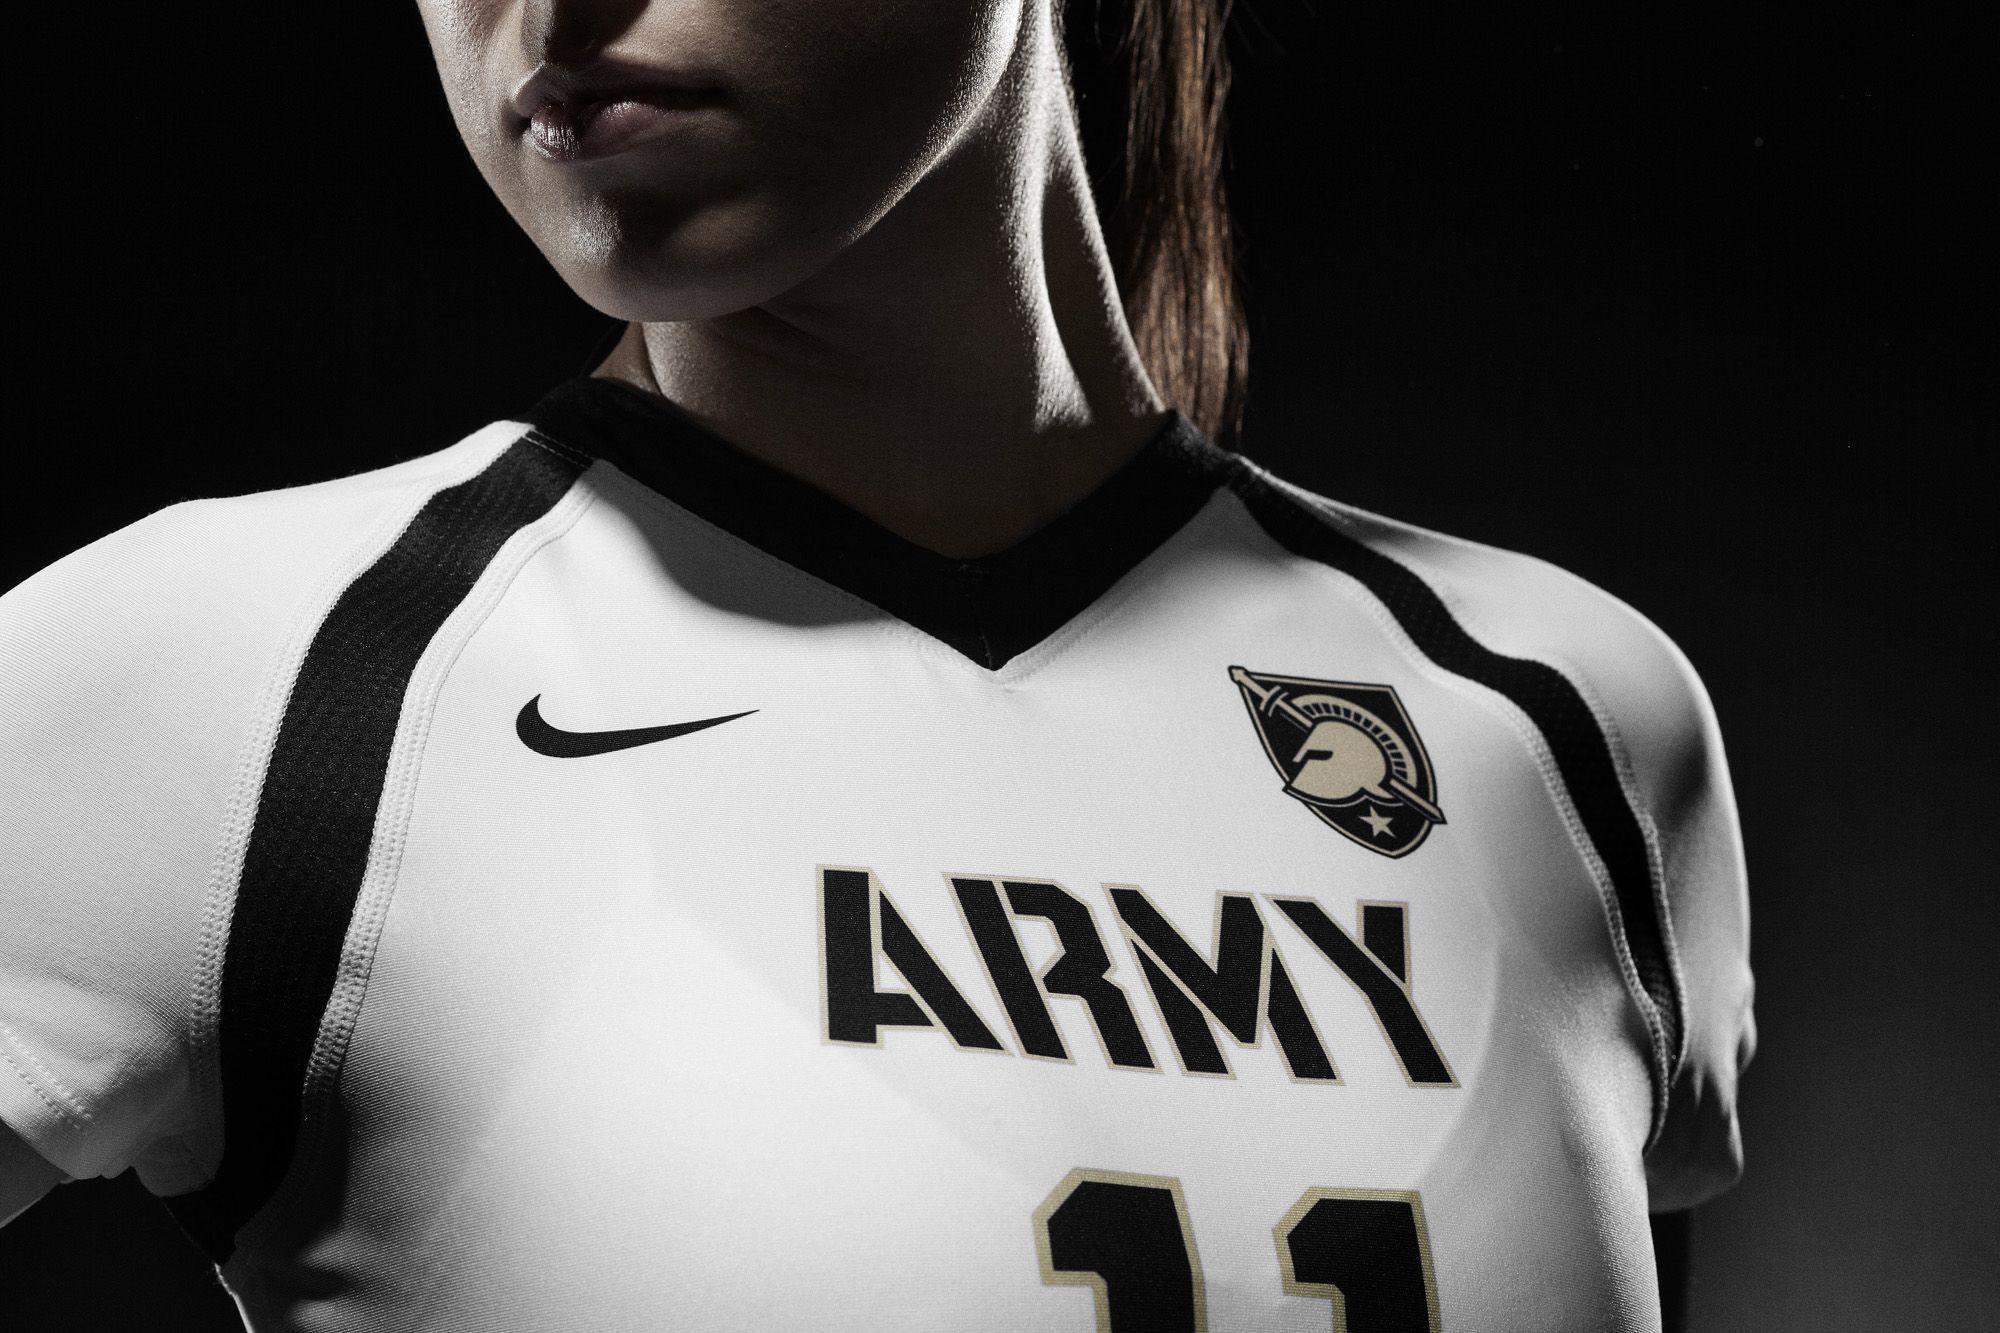 Army West Point Sports Design West Point West Point Uniform